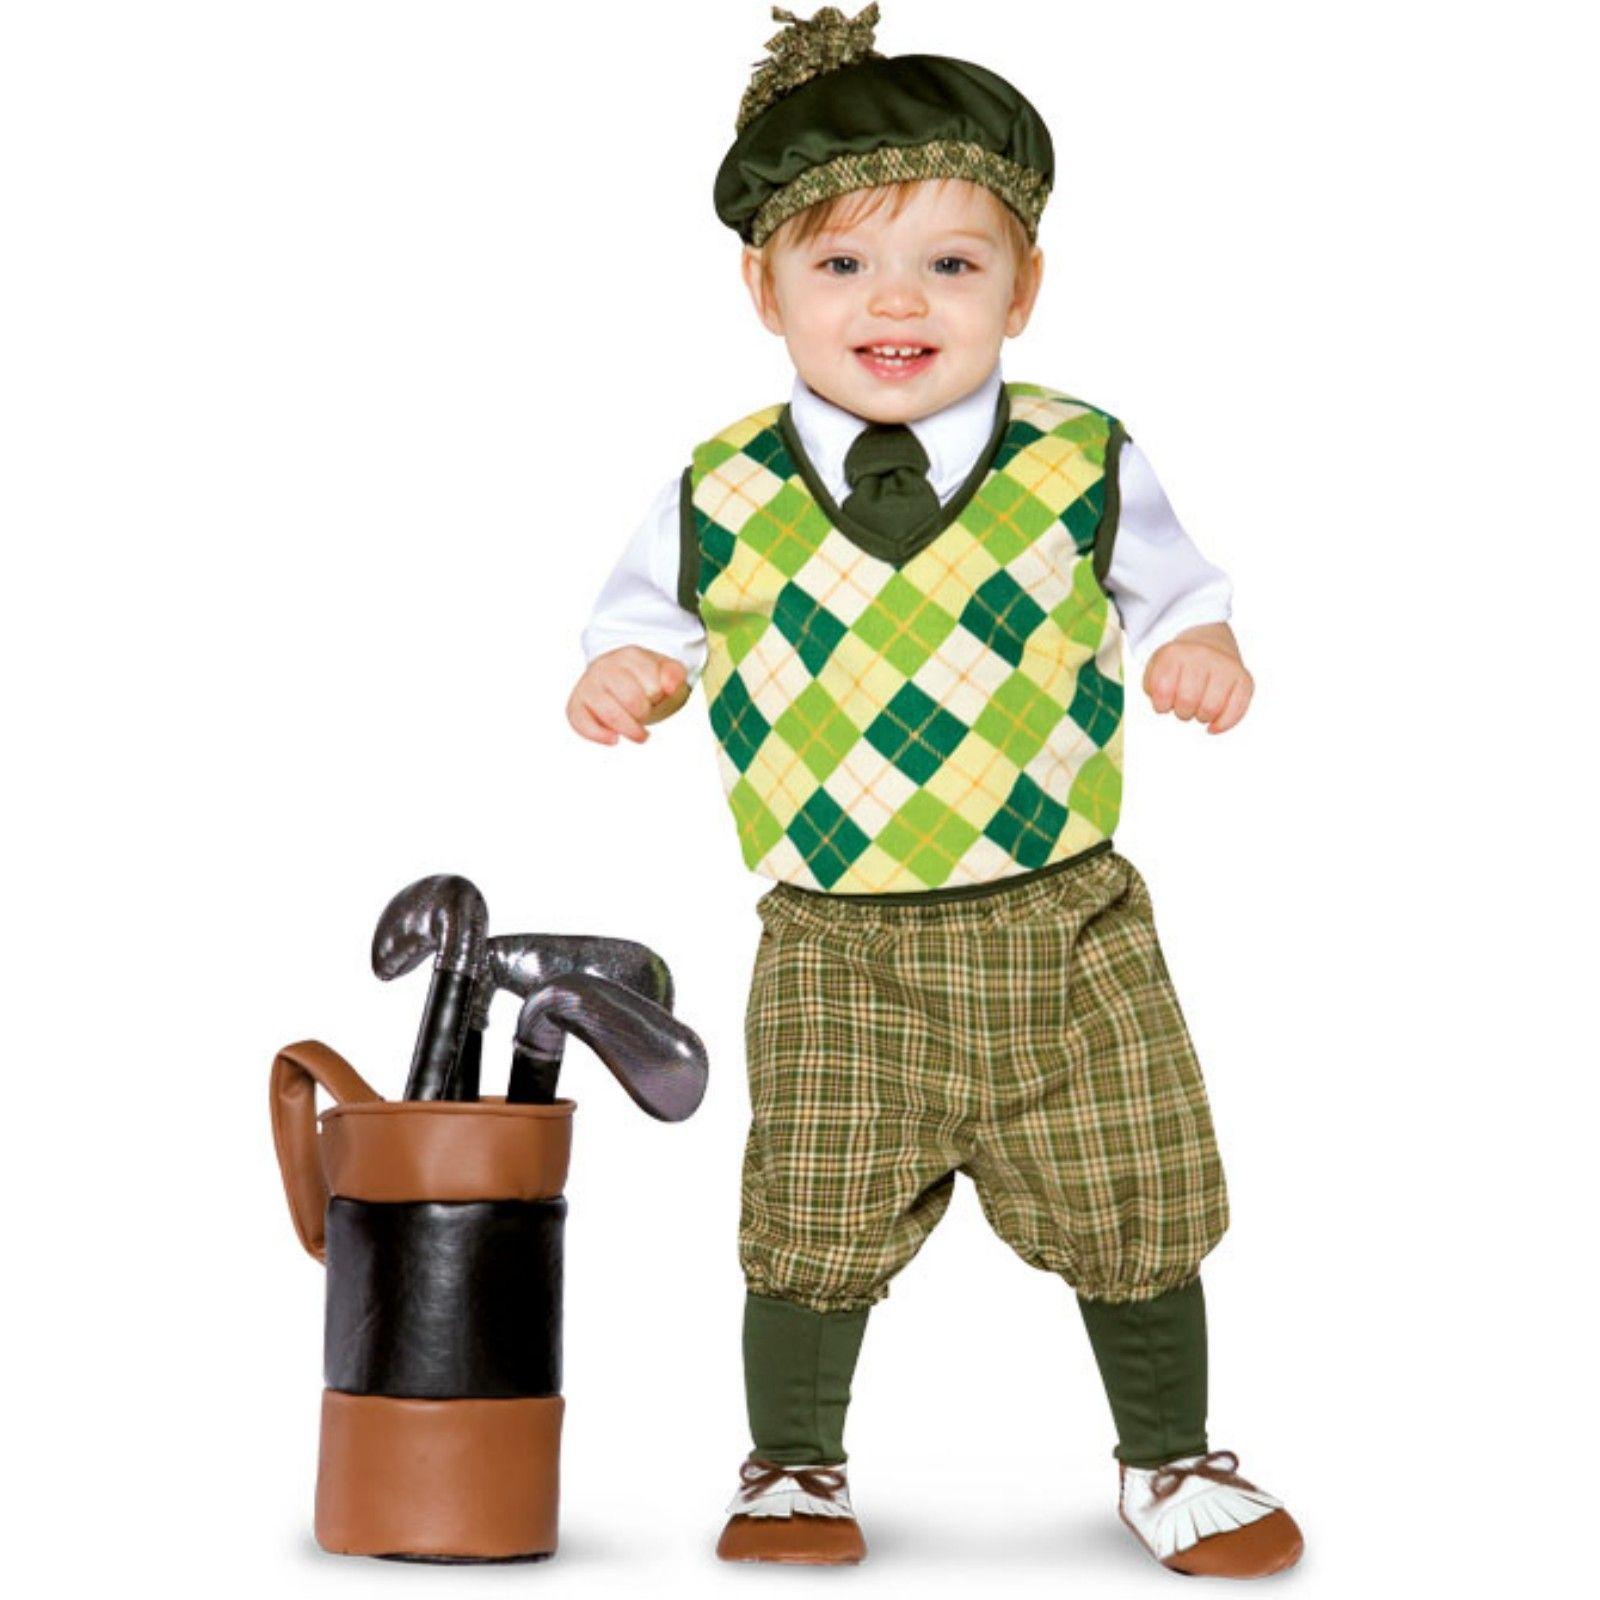 Toddler Purim Costumes